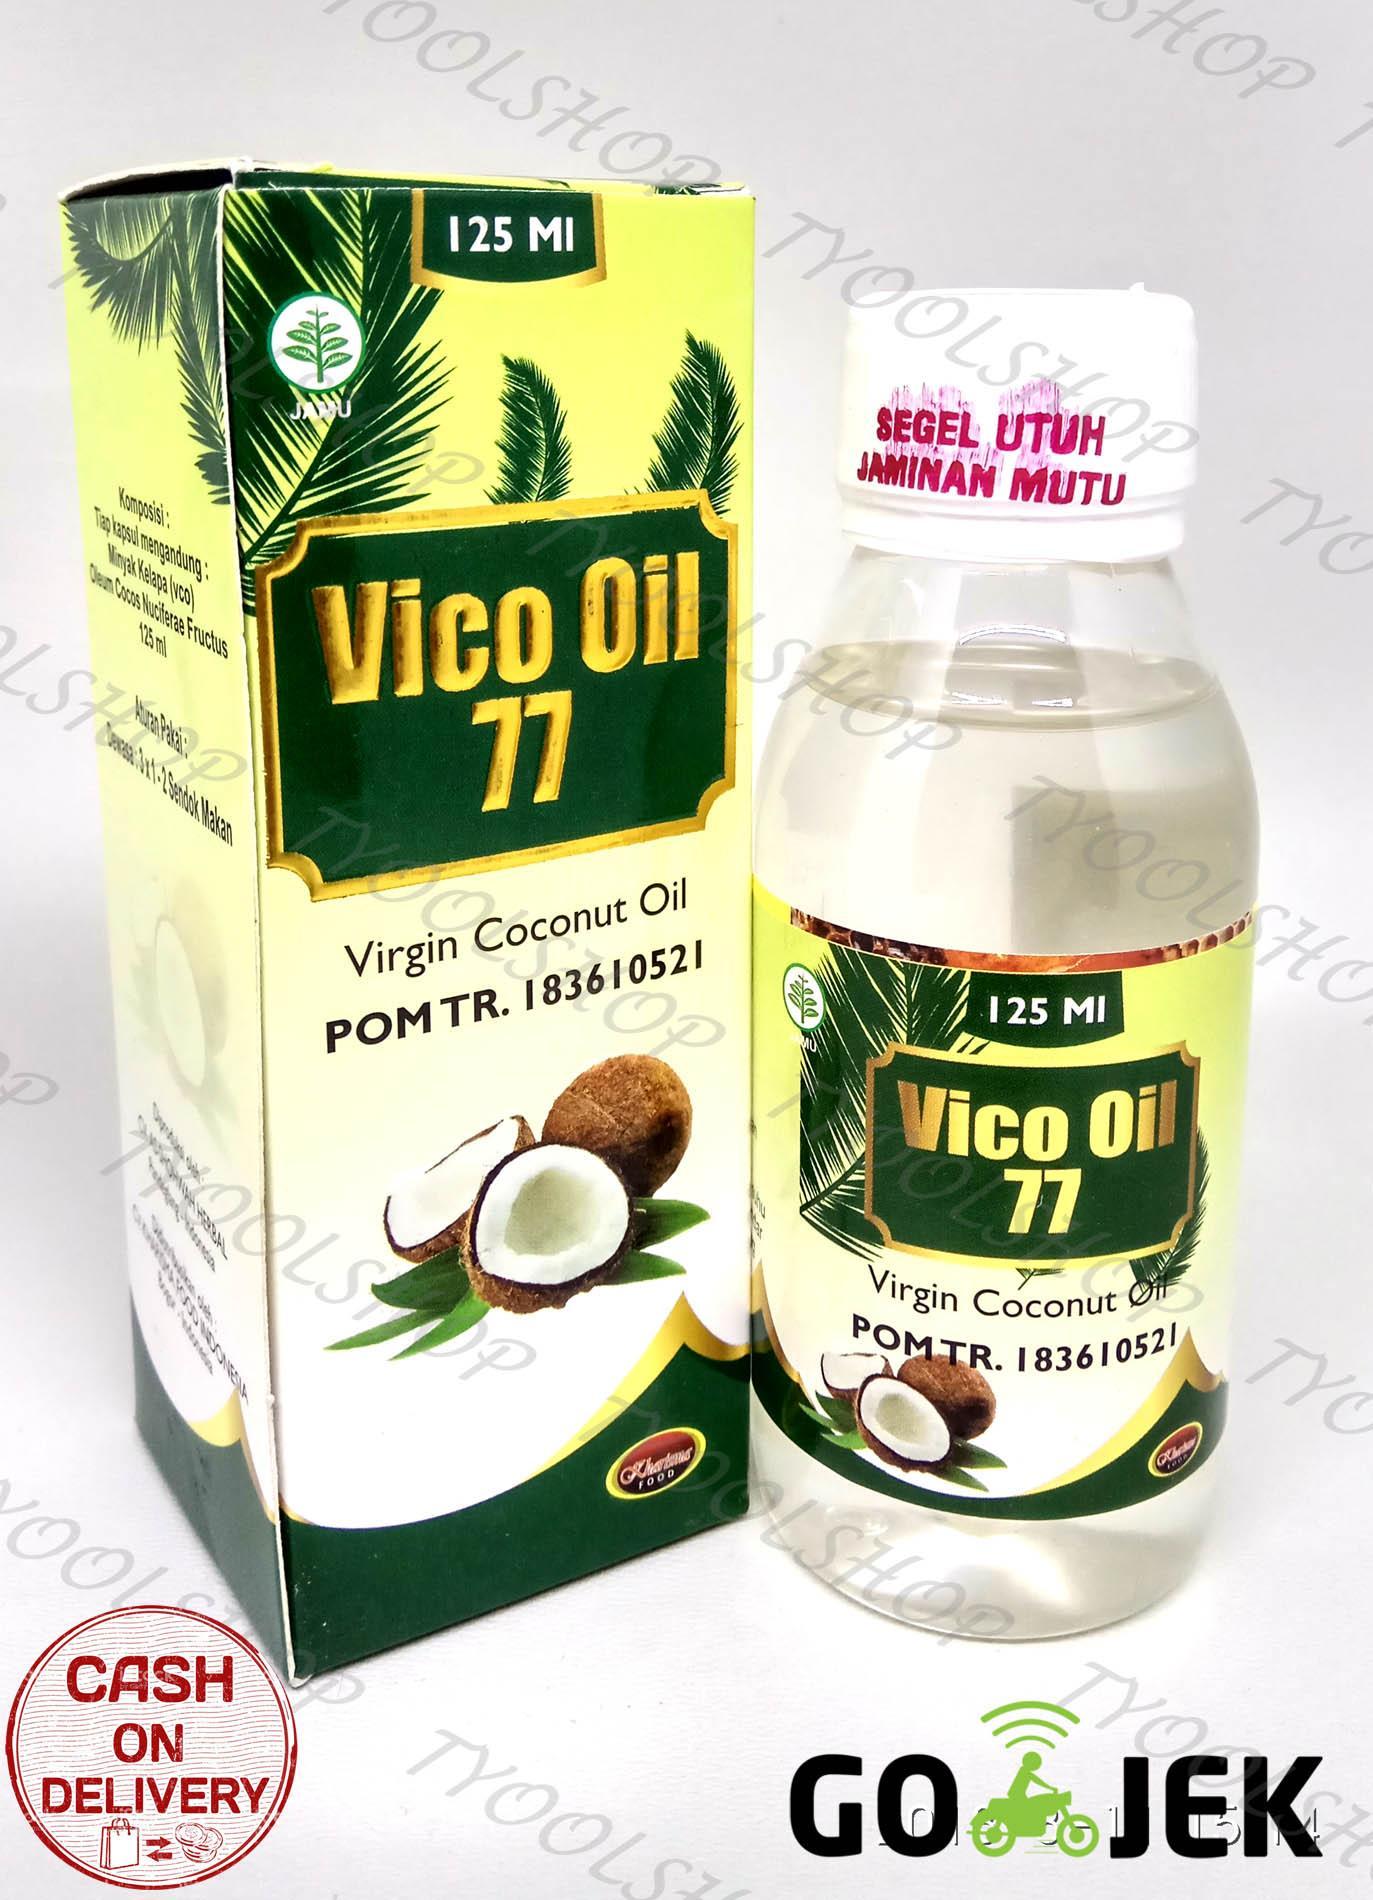 Buy Sell Cheapest Makanan Super Vico Best Quality Product Deals Vco Virgin Coconut Oil By Bagoes Minyak Kelapa Murni Spesial 77 Kharisma 125ml